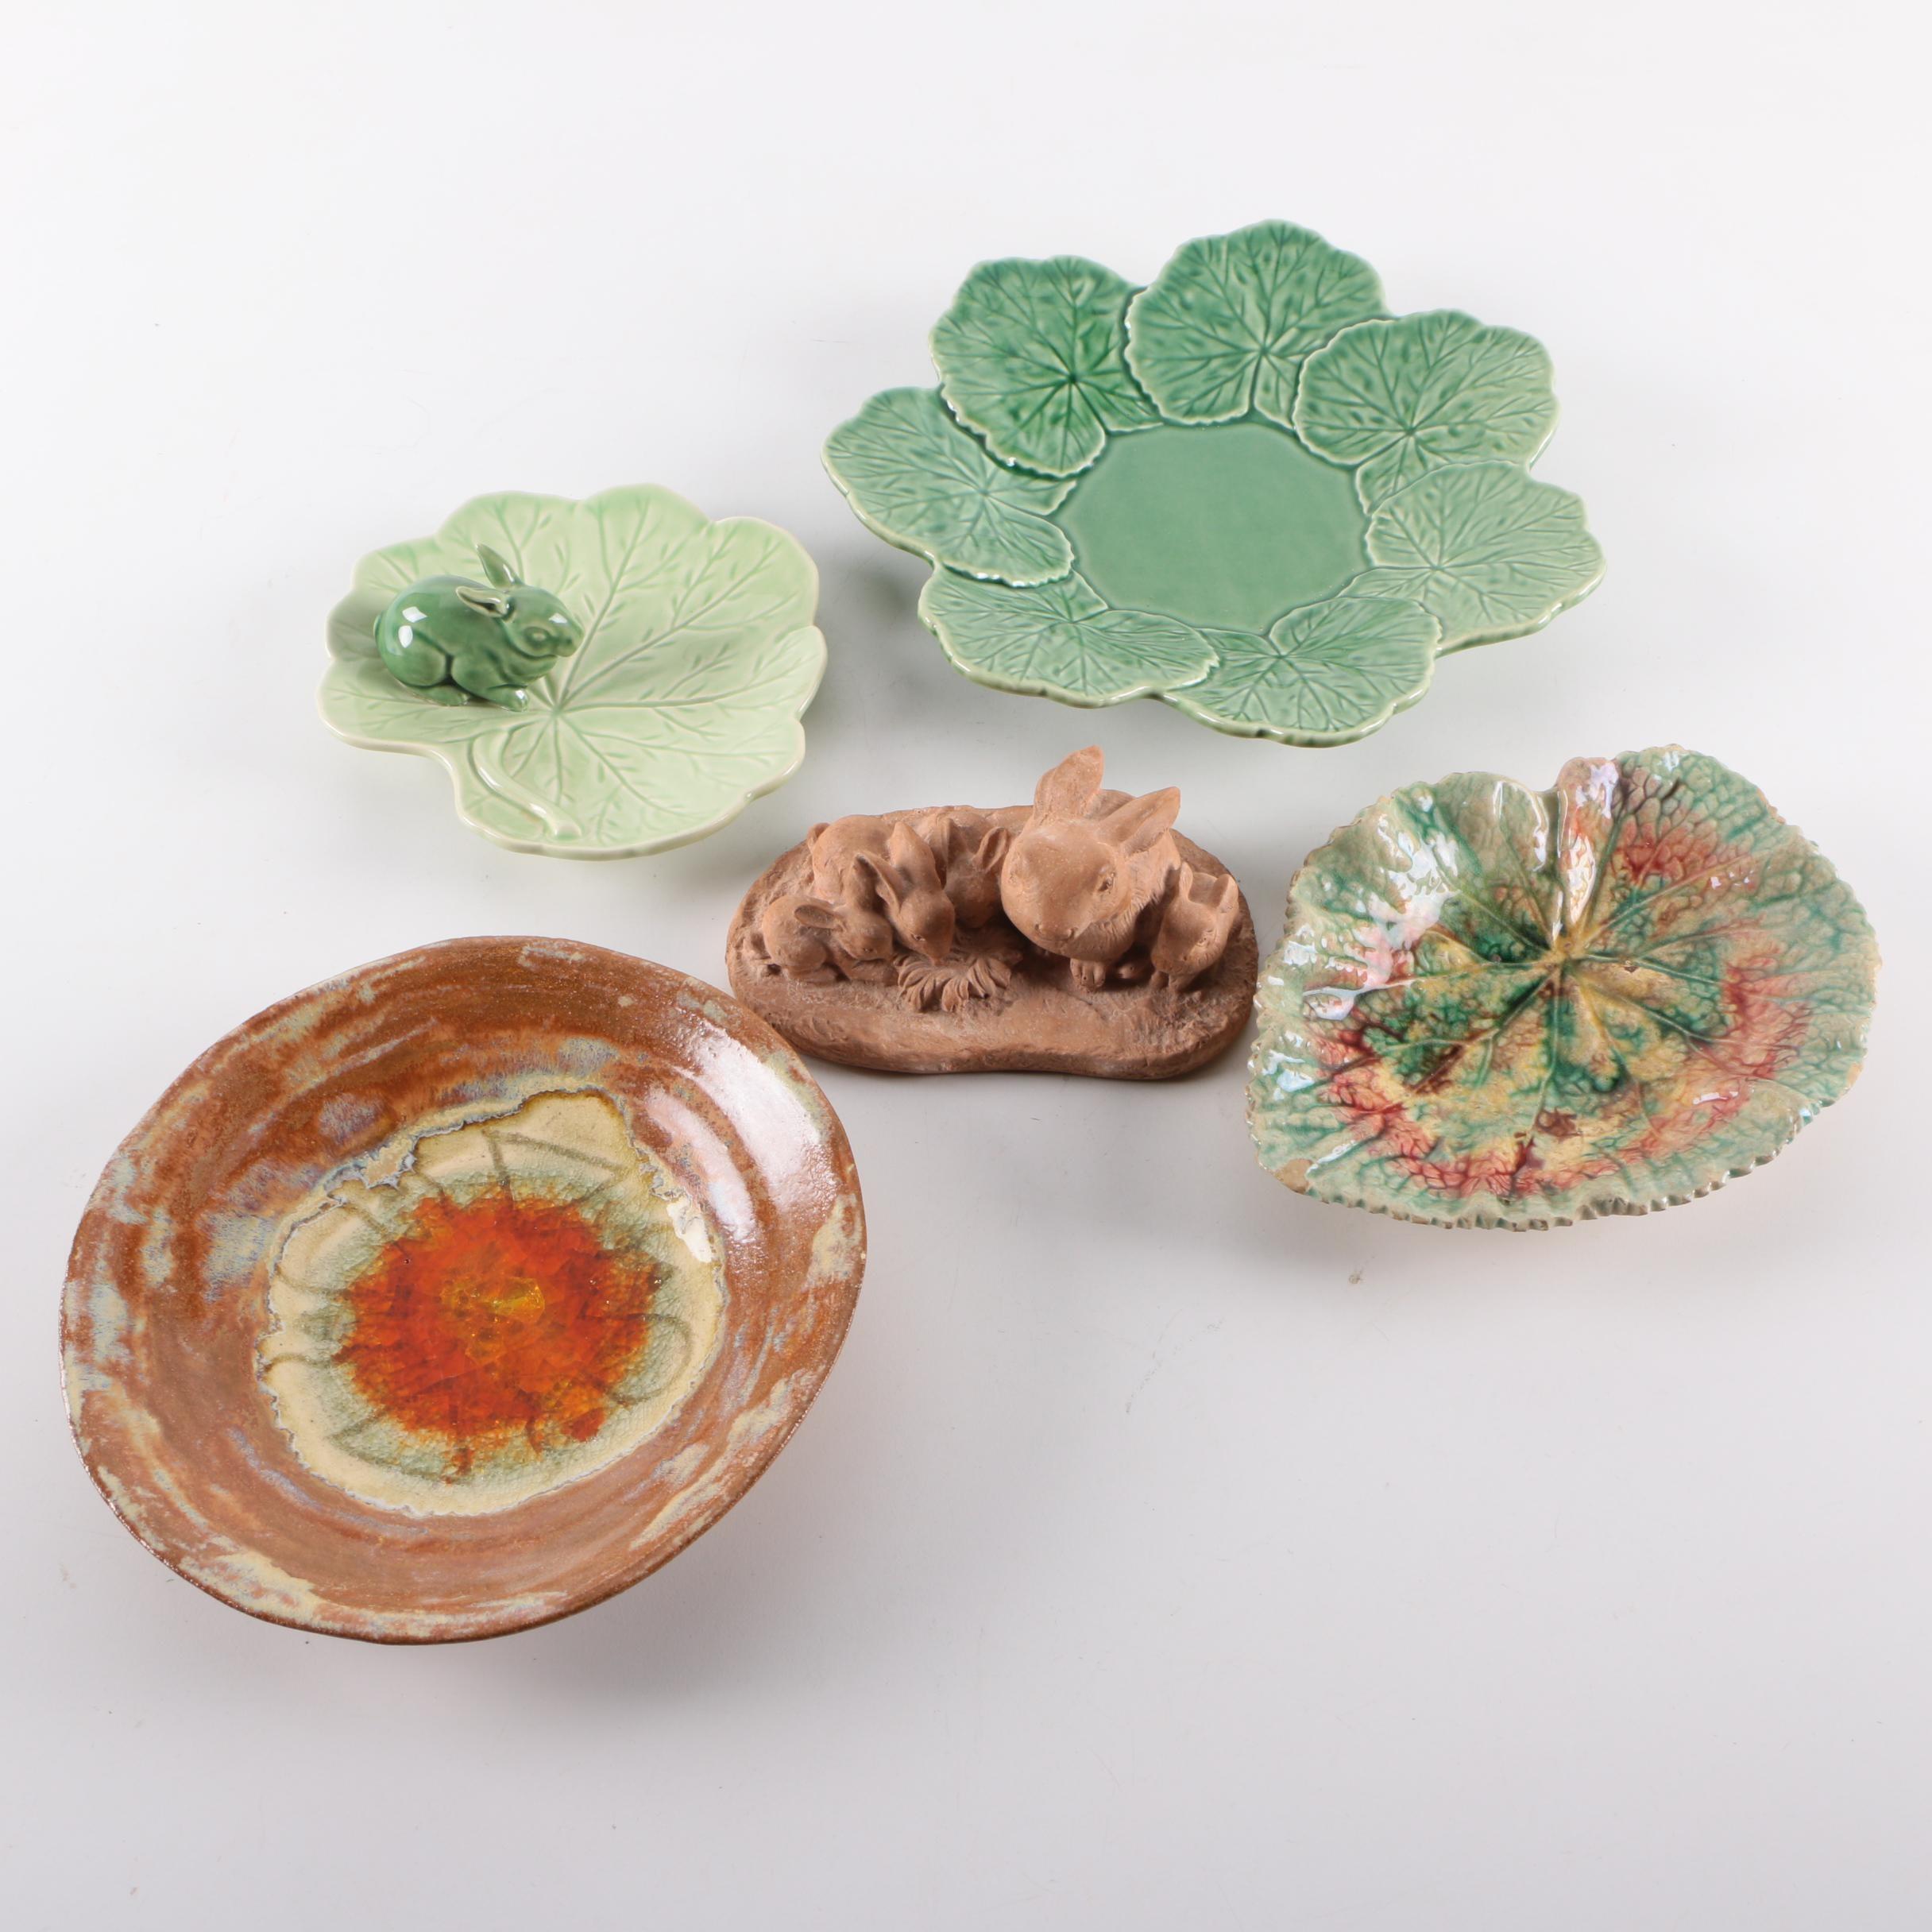 Decorative Ceramic Serving Plates and a Rabbit Figurine ... & Decorative Ceramic Serving Plates and a Rabbit Figurine : EBTH